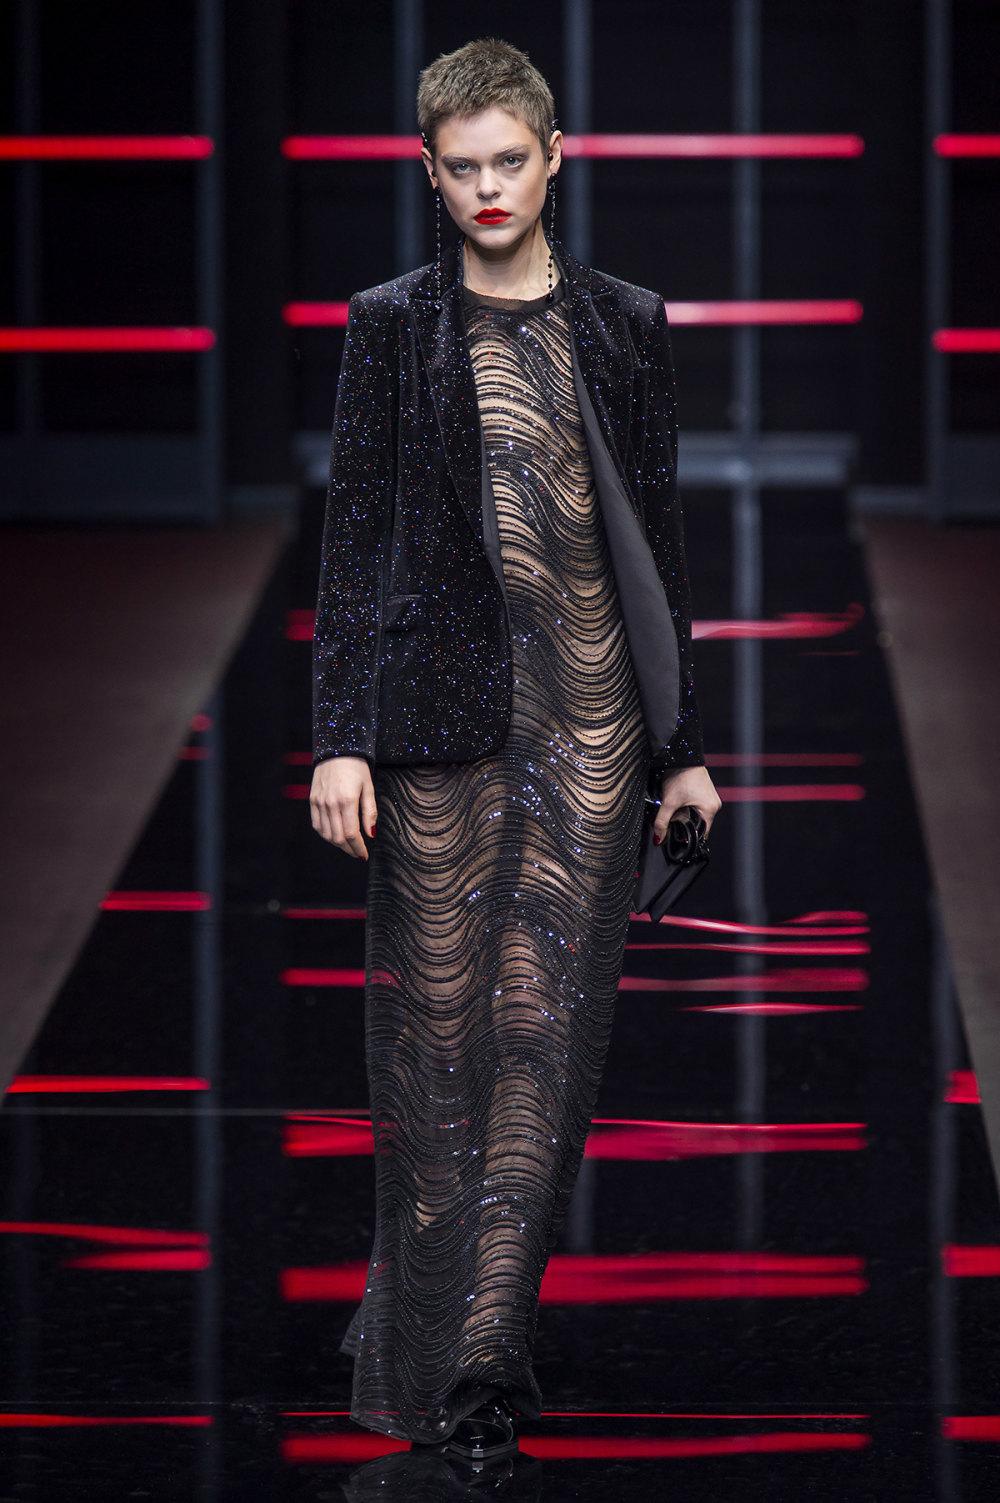 Emporio Armani时装系列畅的裤子带有柔滑裙子的鸡尾酒礼服-50.jpg